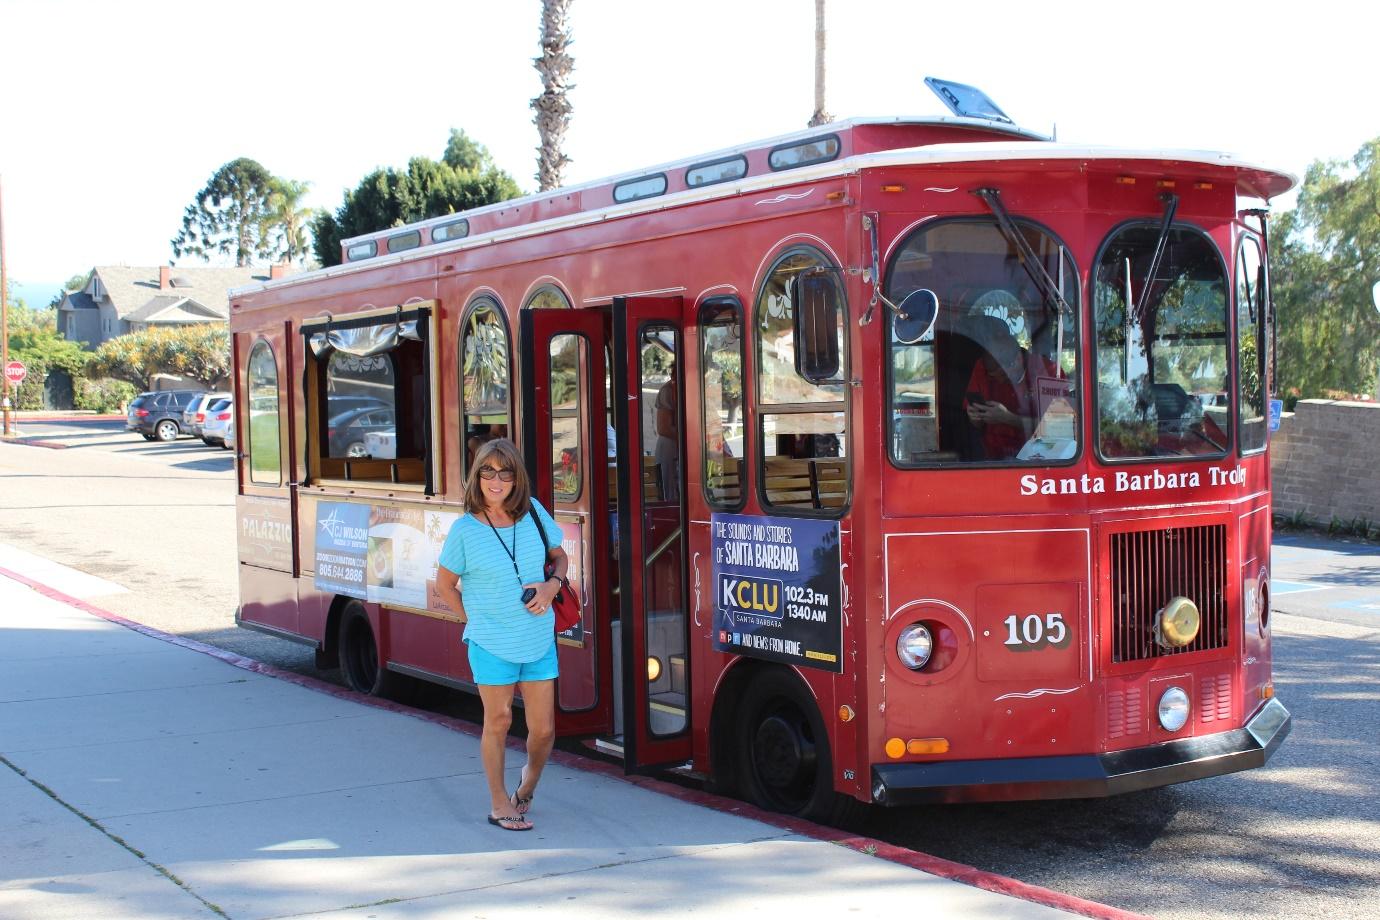 Trolley tour of Santa Barbara